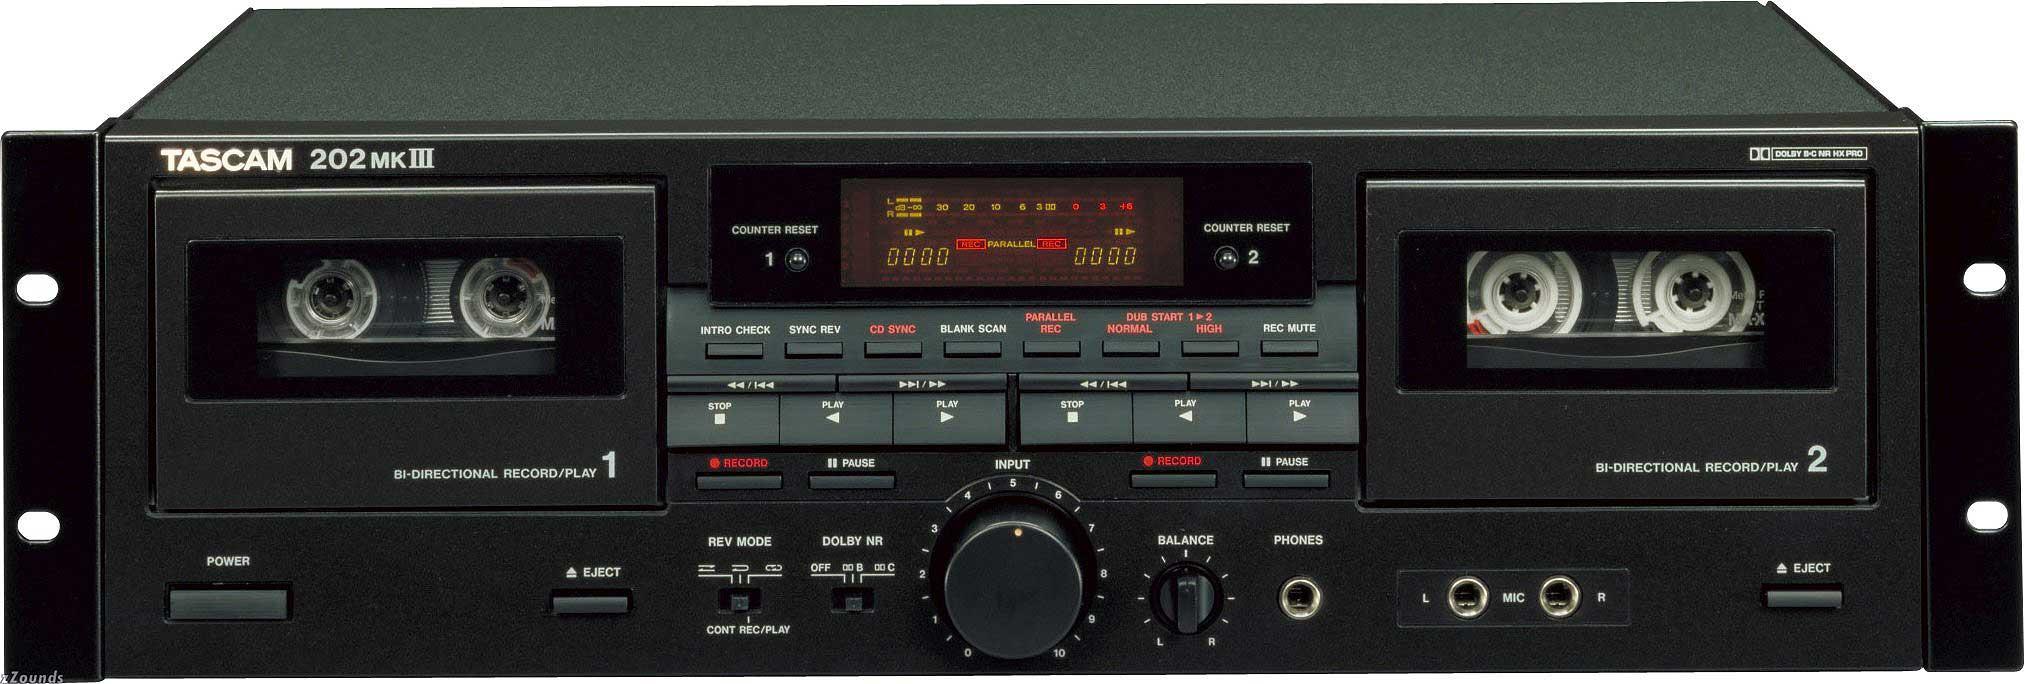 cd dubbing machine